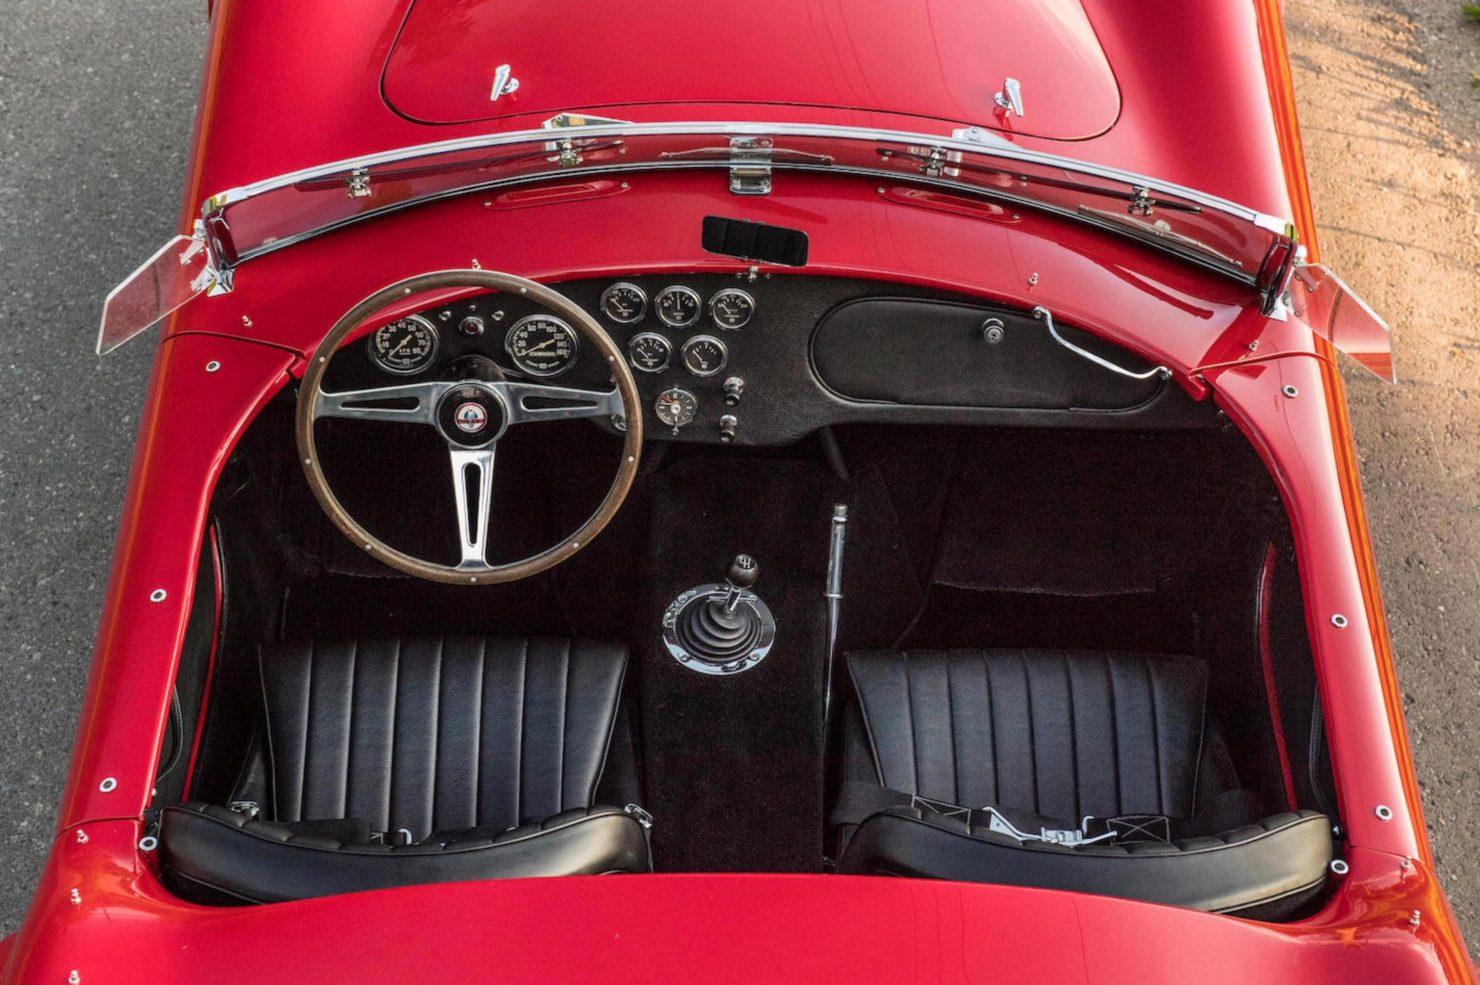 shelby ac cobra 289 22 1480x985 - 1964 Shelby AC Cobra 289